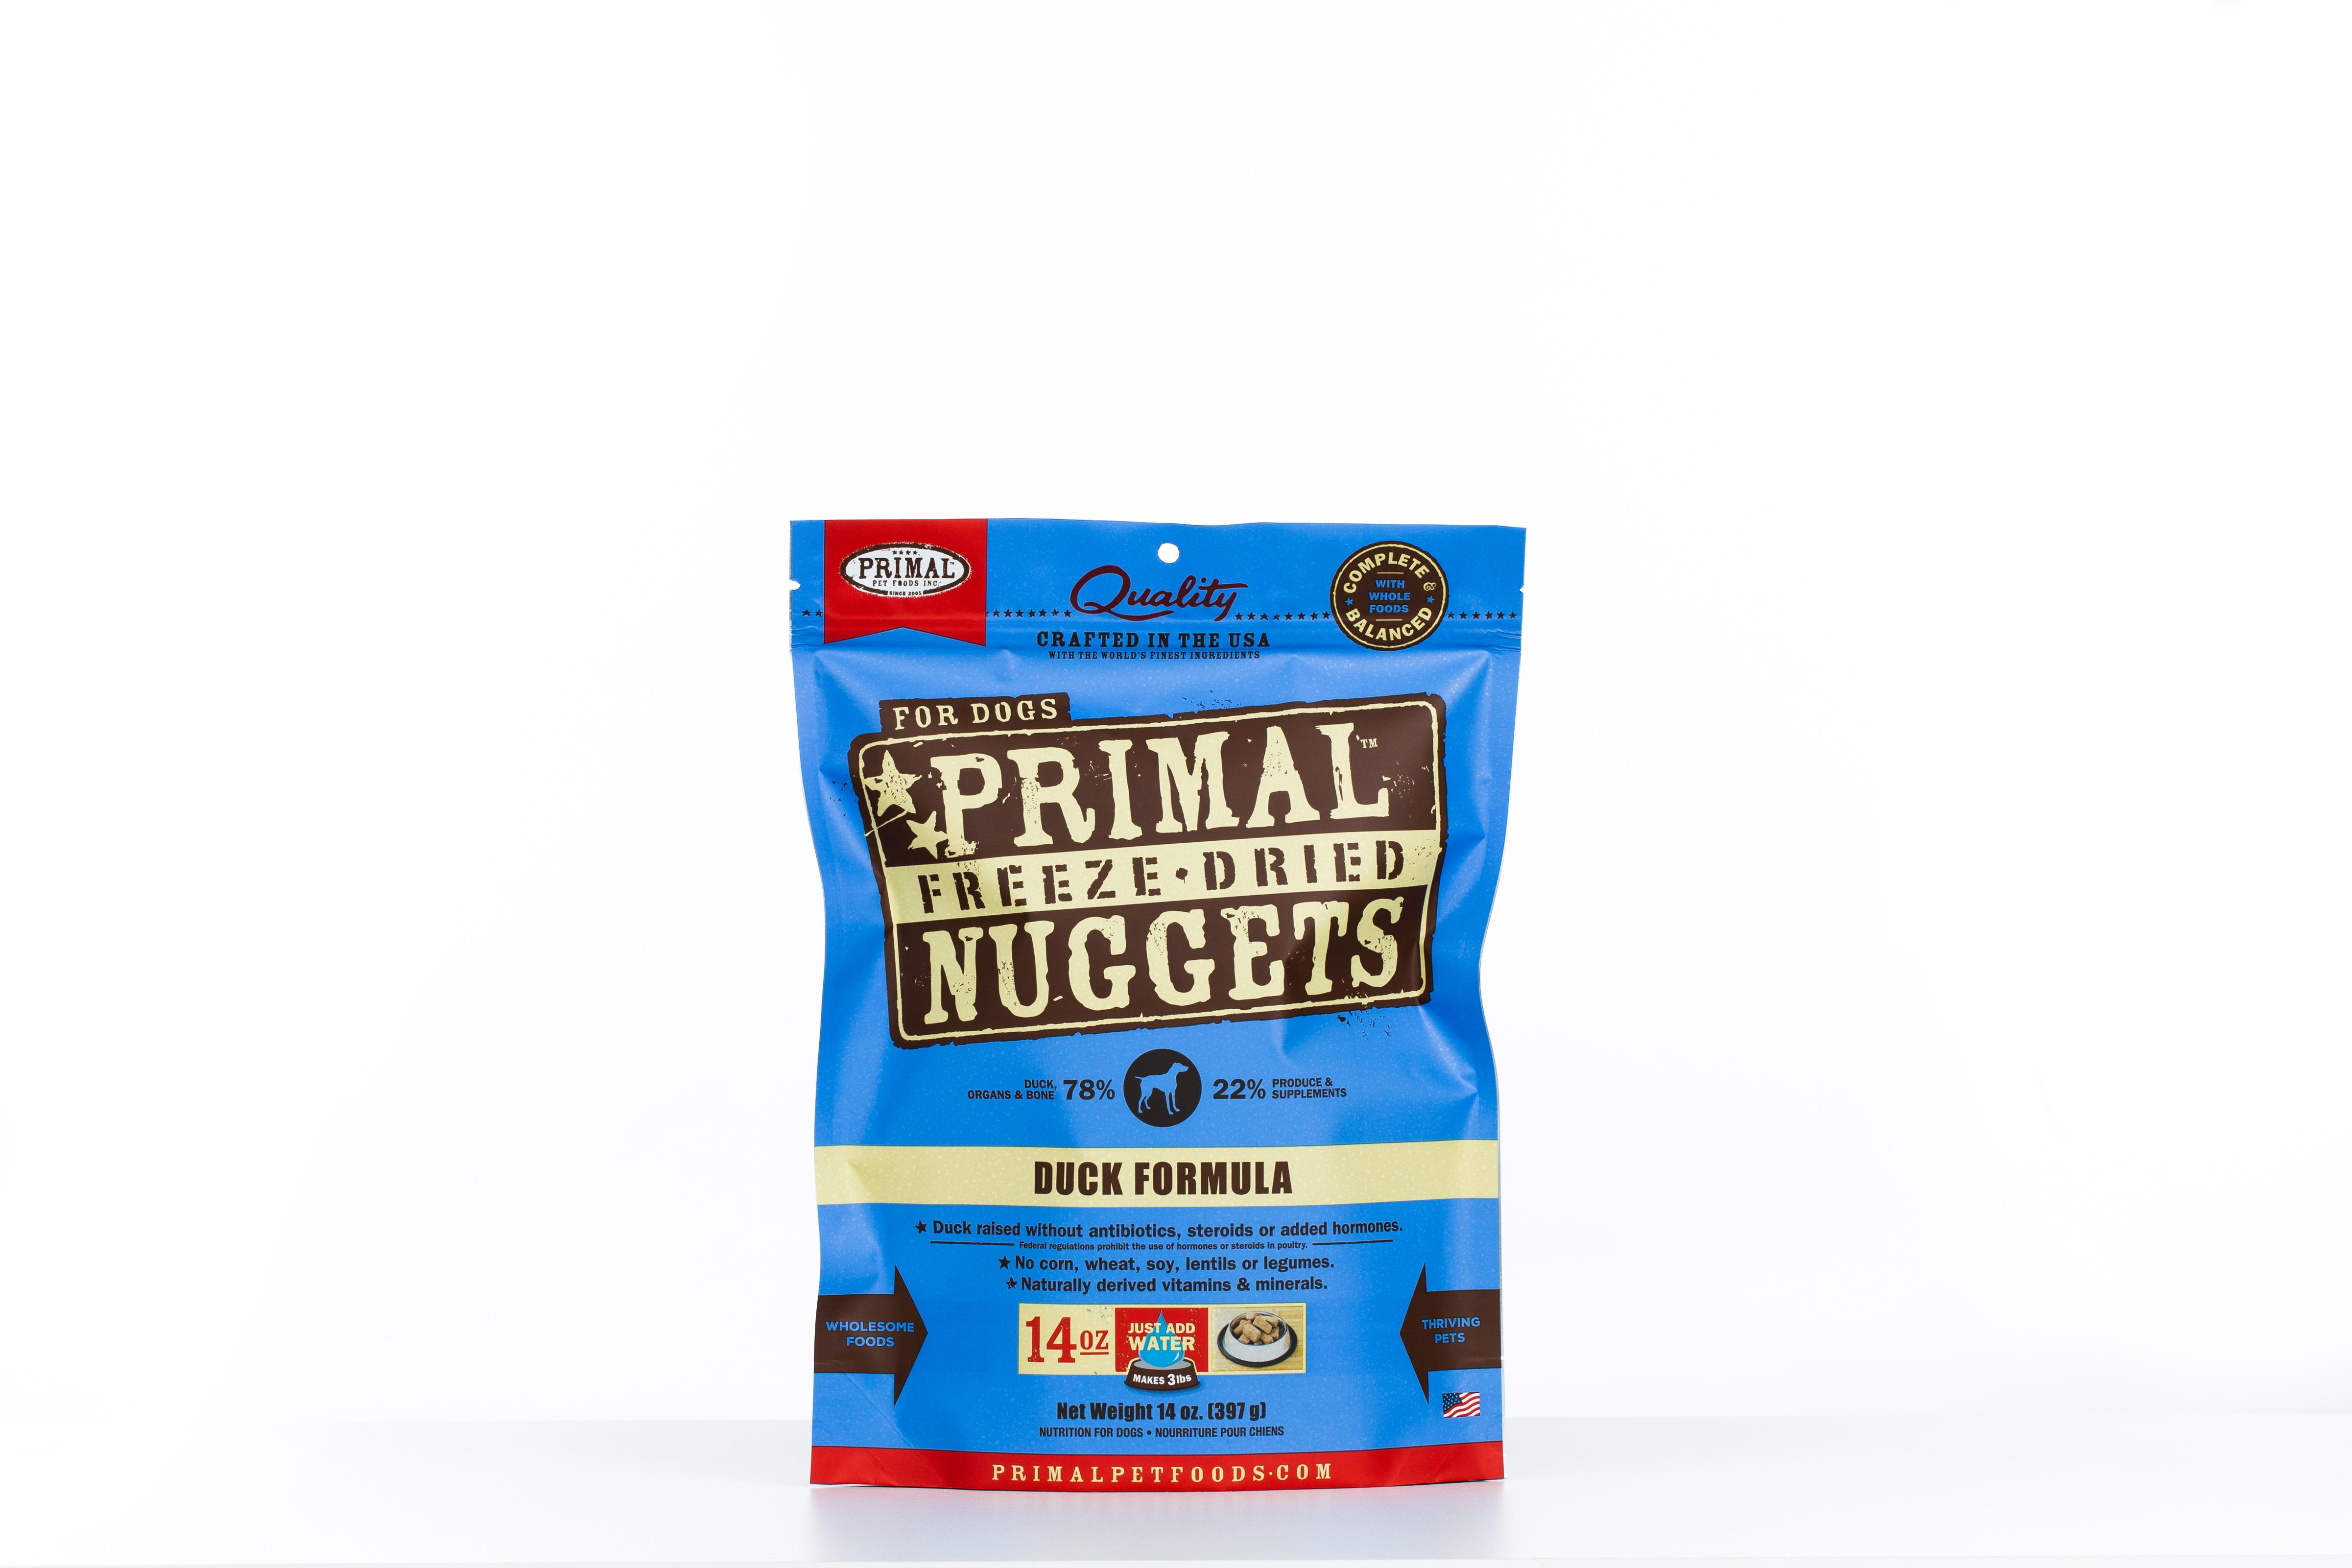 Primal Duck Formula Nuggets Grain-Free Raw Freeze-Dried Dog Food, 14-oz bag